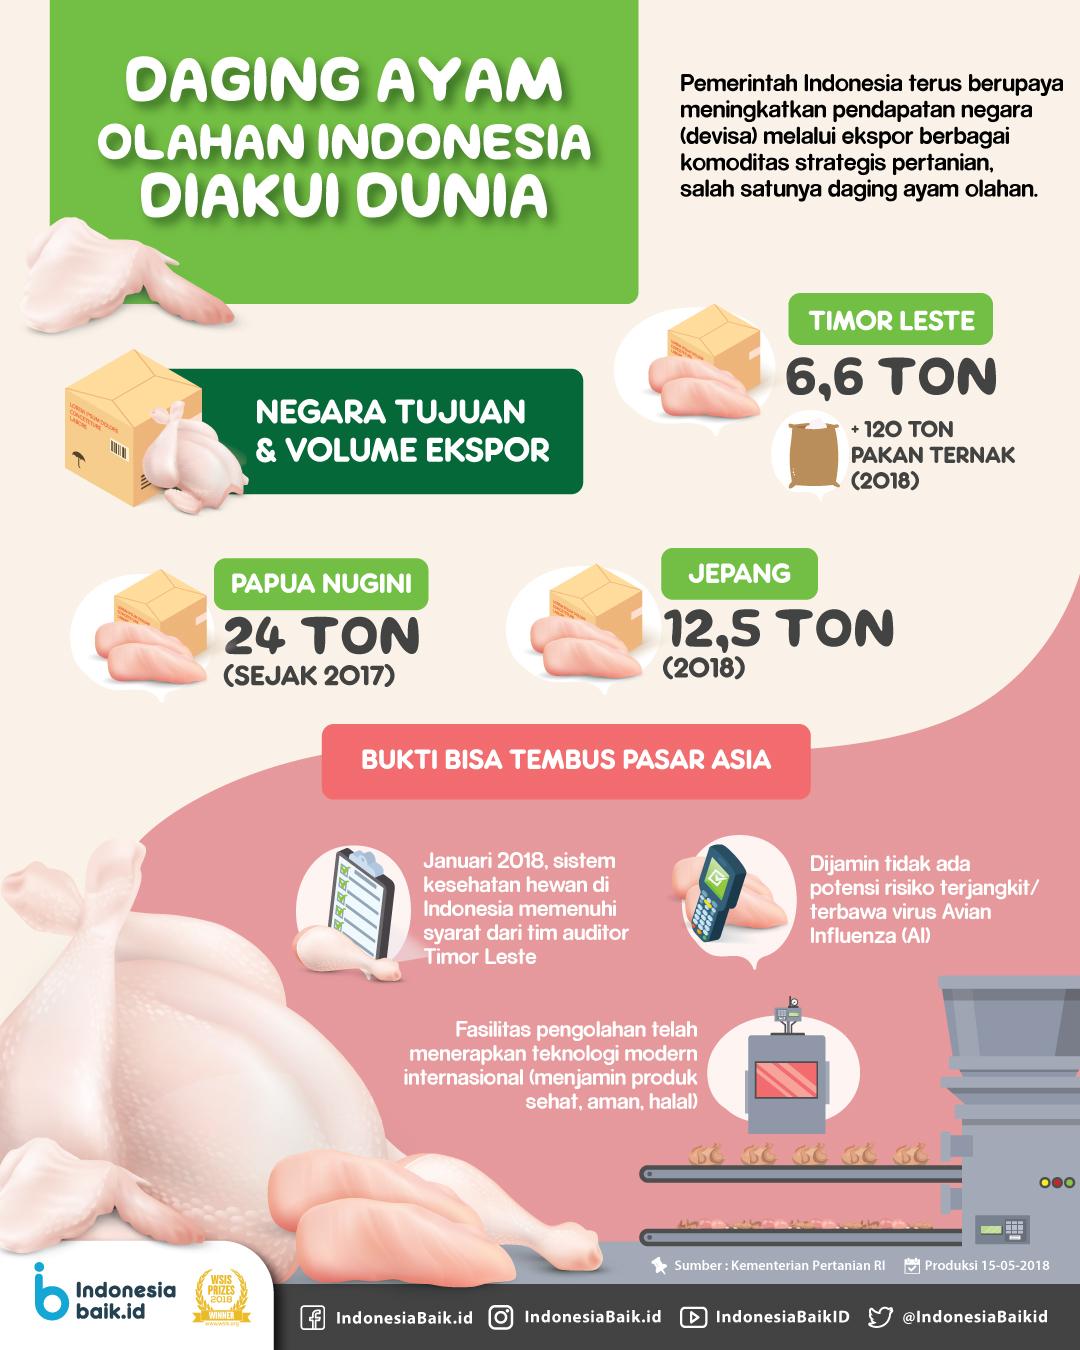 Daging Ayam Olahan Indonesia Diakui Dunia